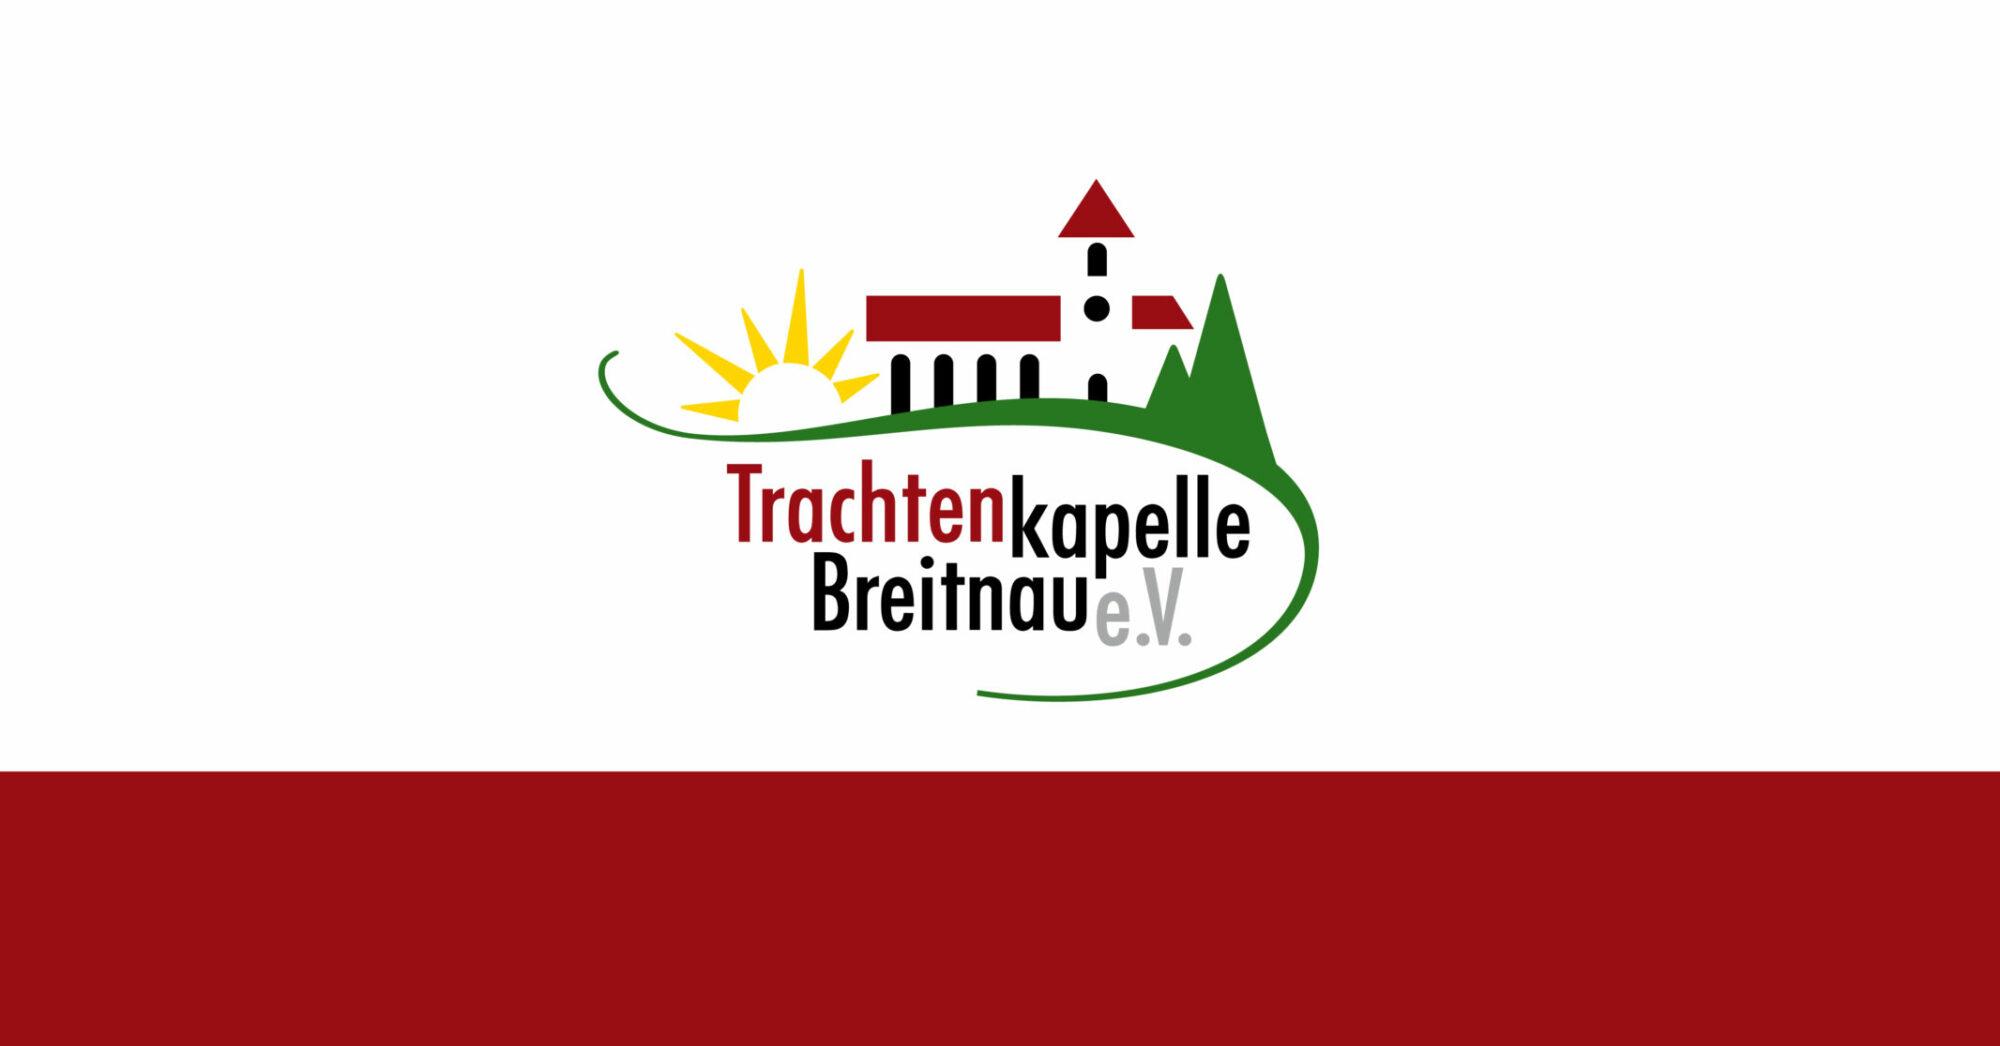 Trachtenkapelle Breitnau